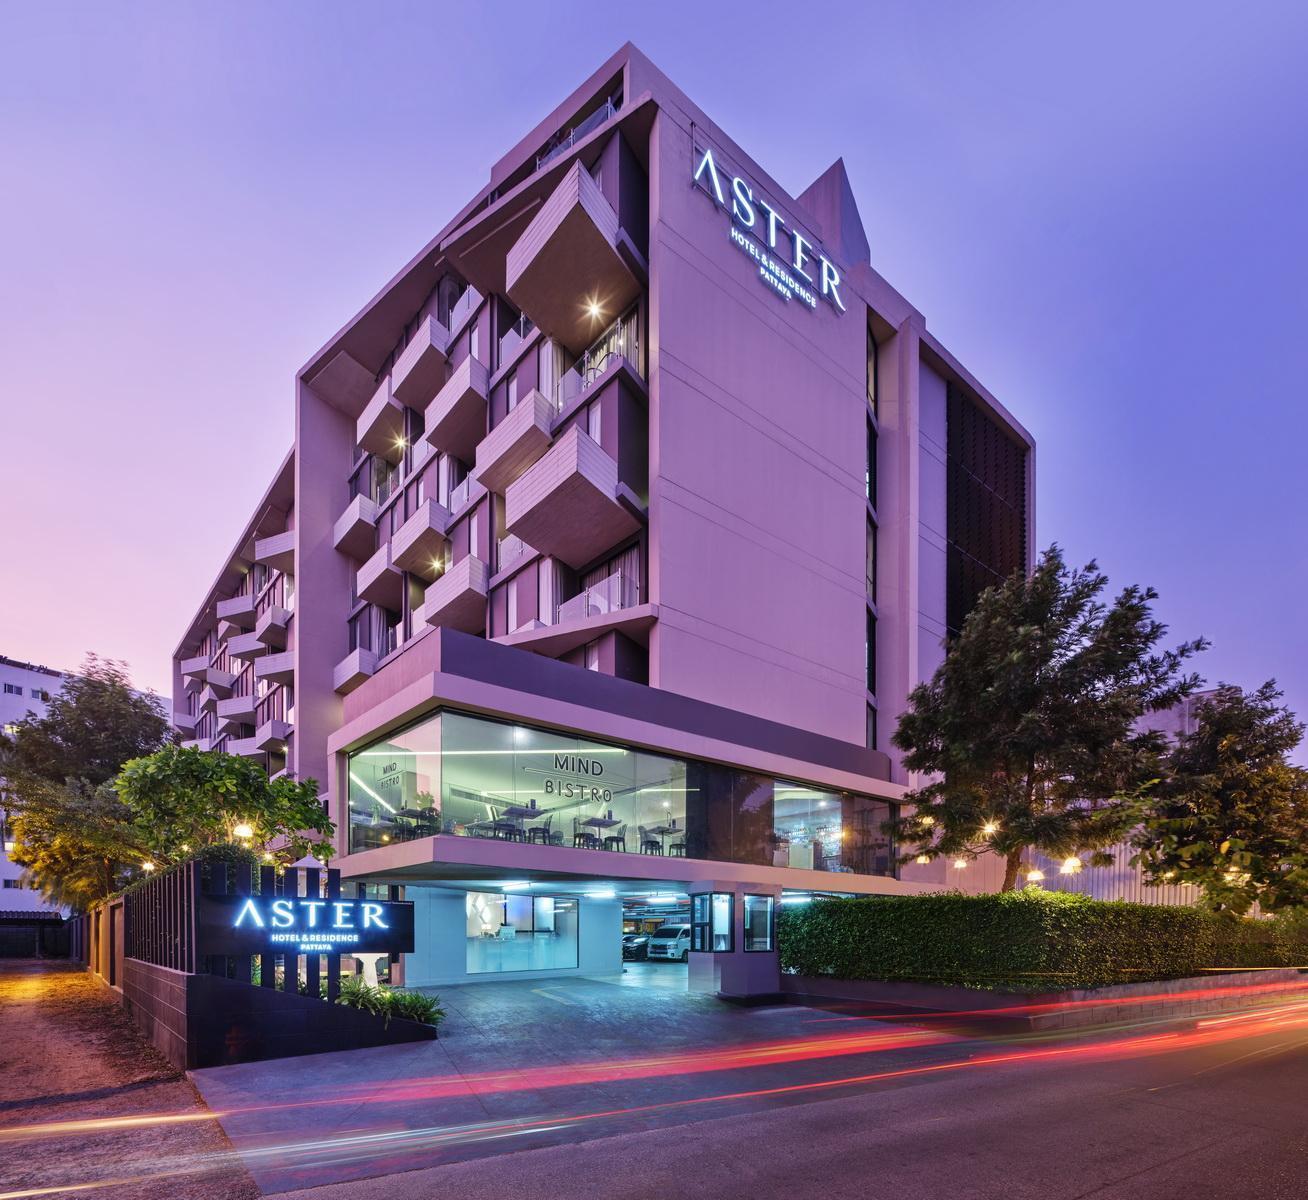 Aster Hotel and Residence แอสเทอร์ โฮเต็ล แอนด์ เรสซิเดนซ์